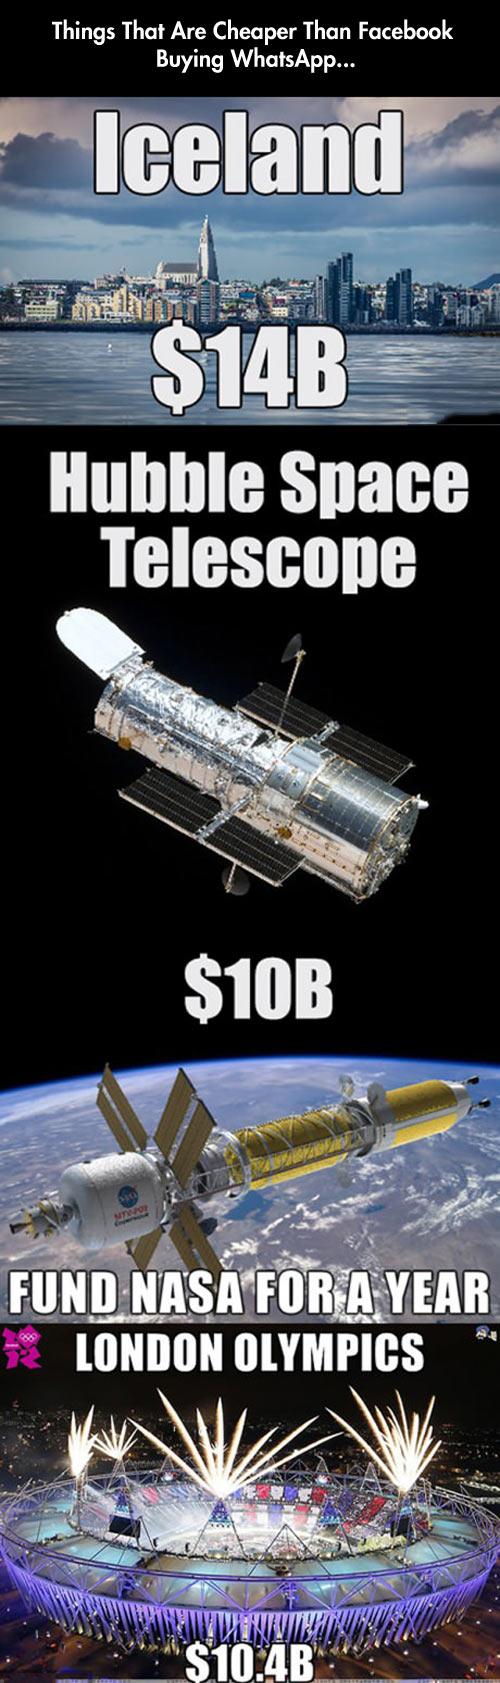 cool-things-cheaper-whatsapp-telescope-Nasa